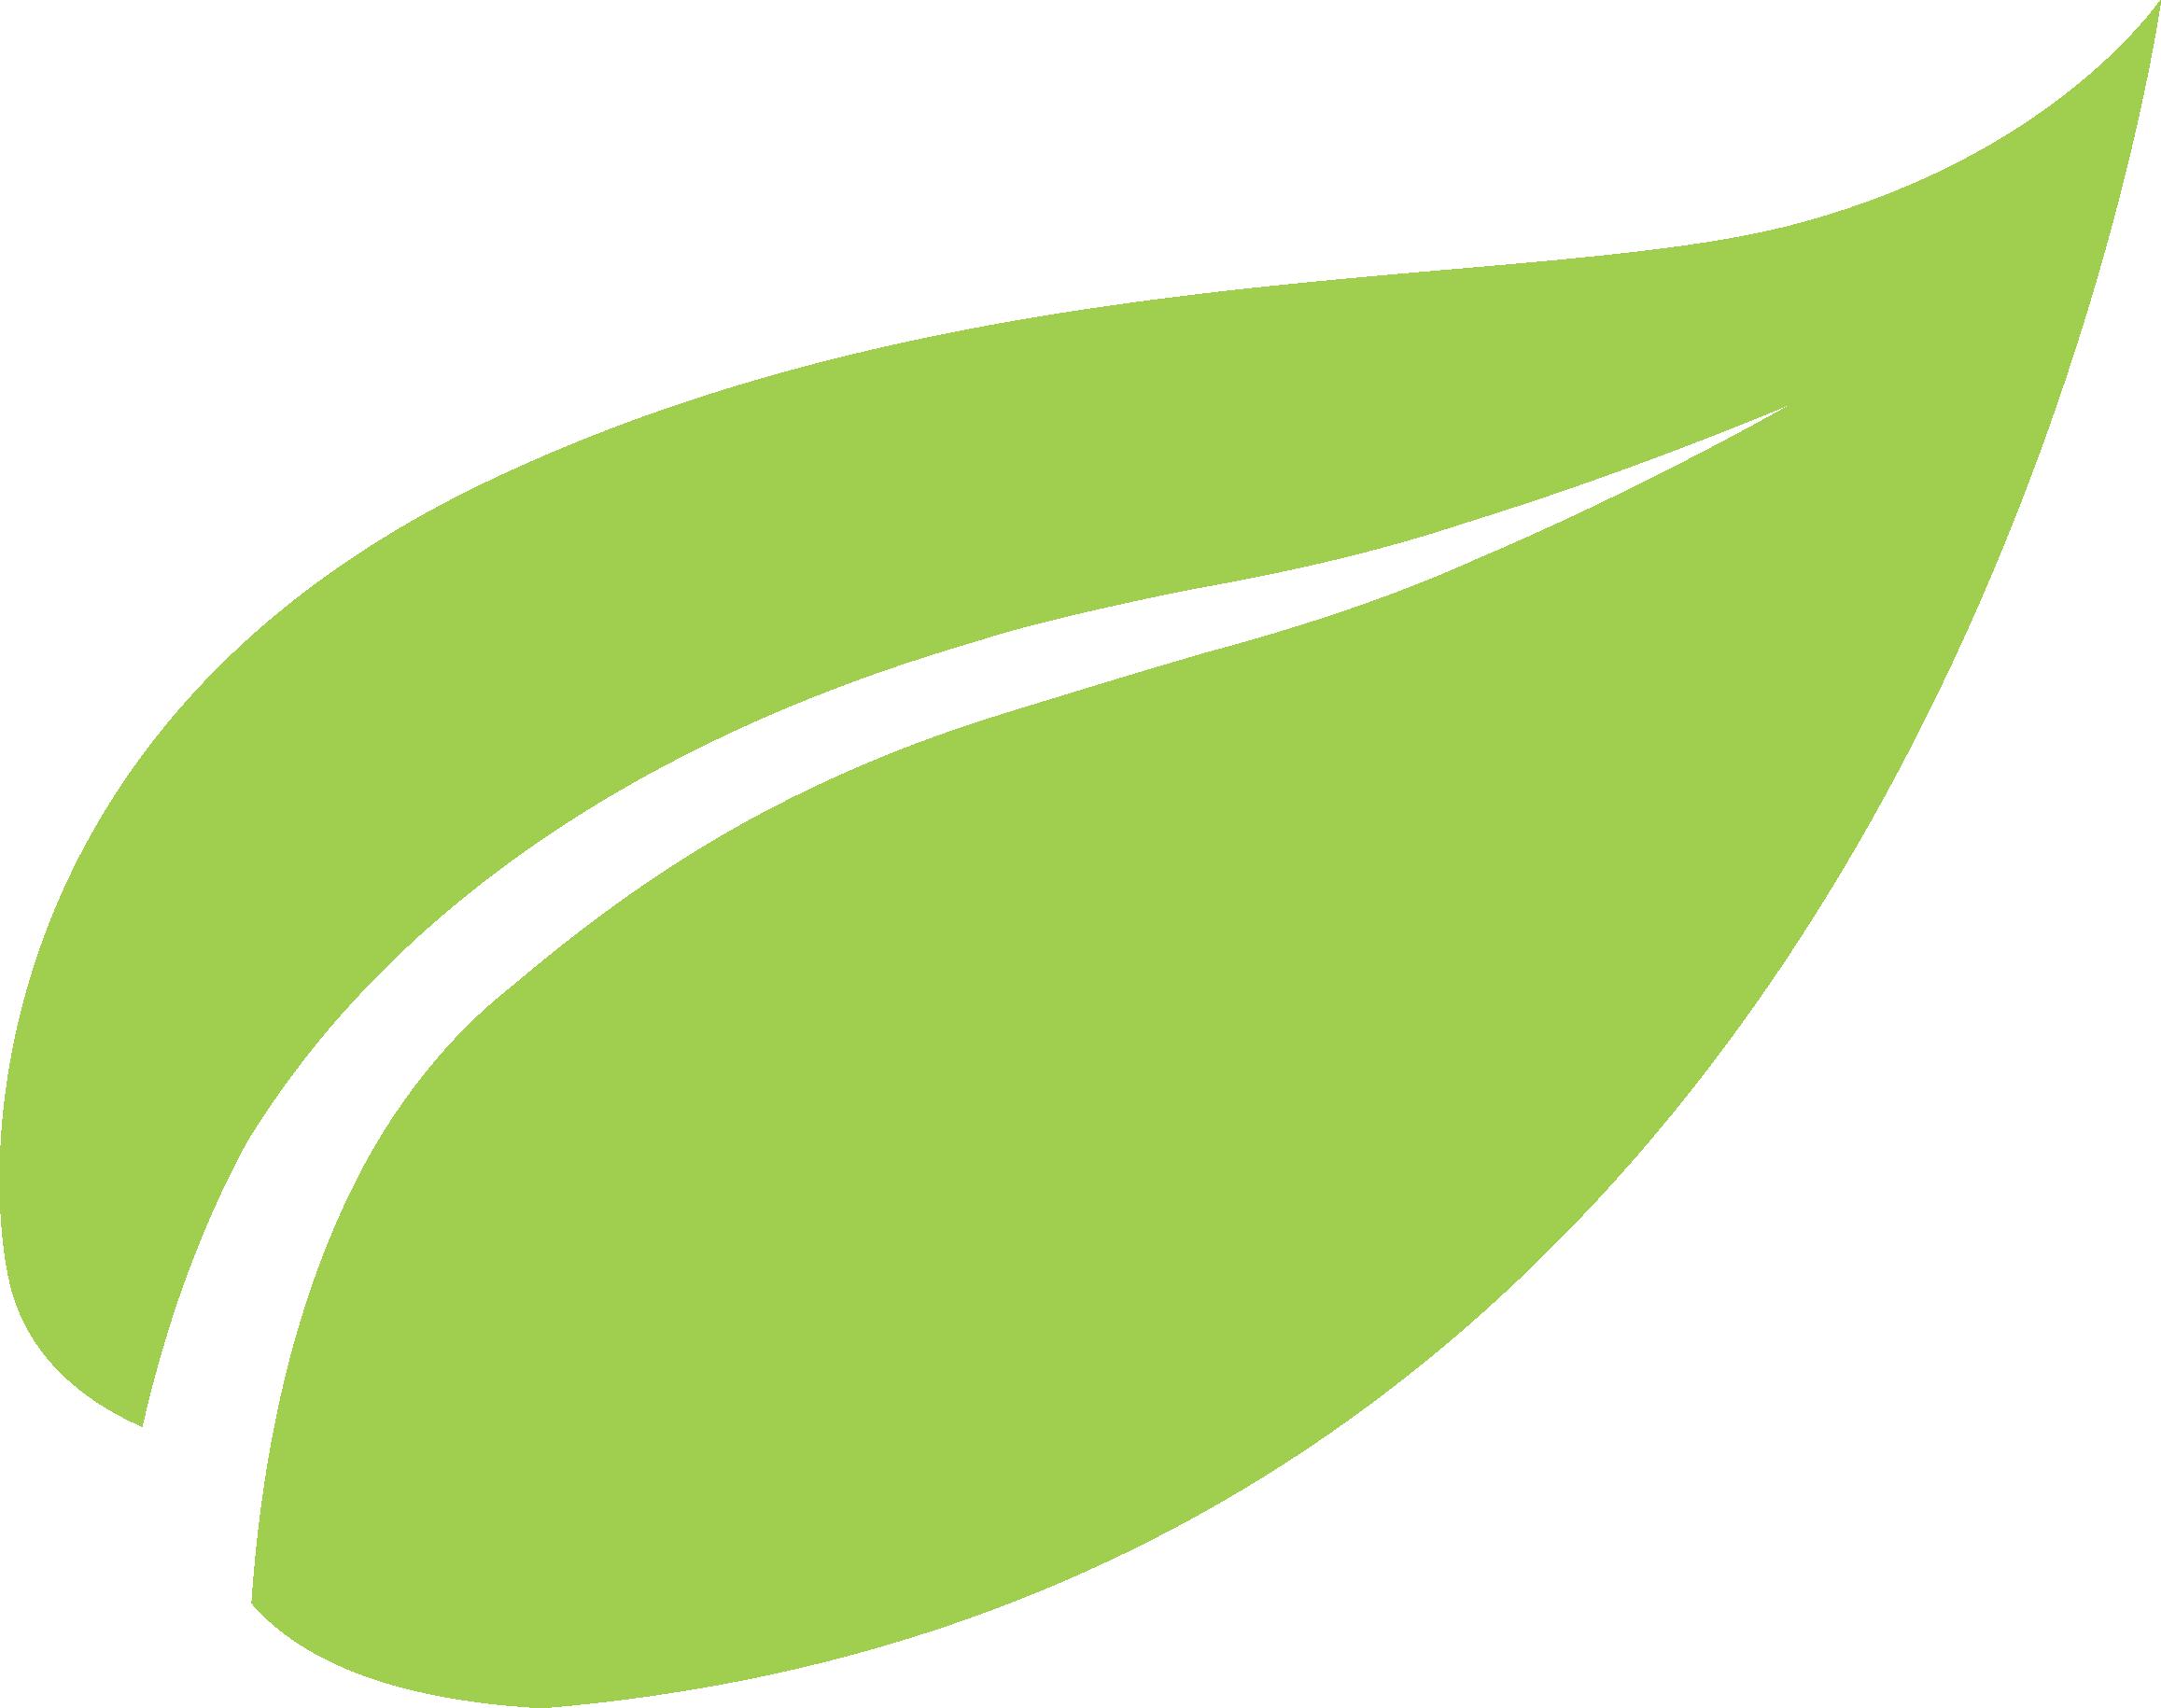 Feuille vert png 3 » PNG Image.